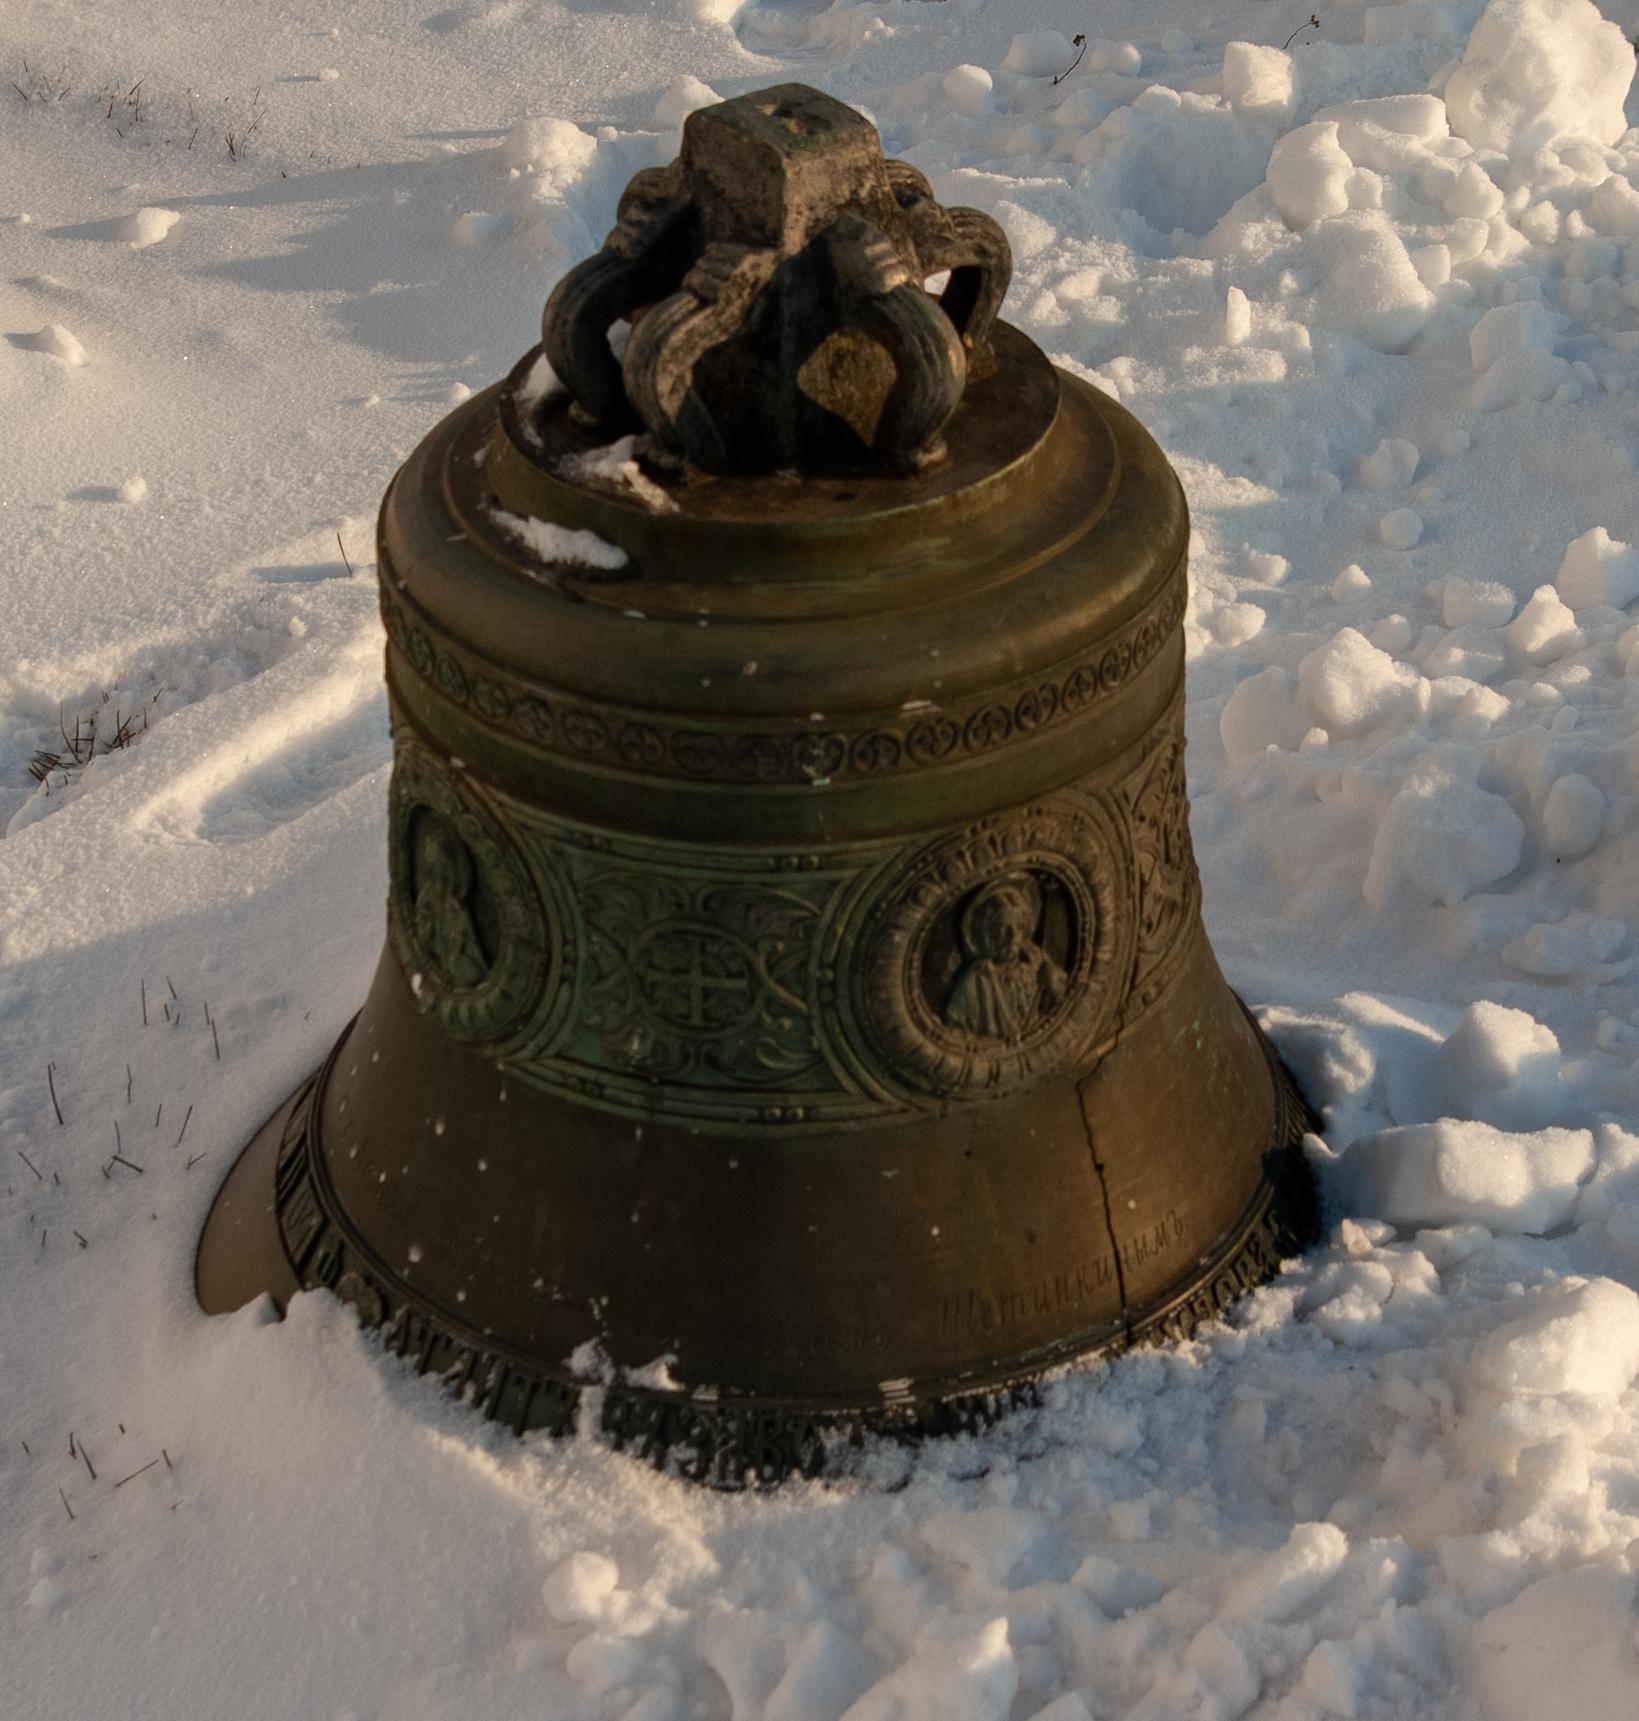 Разбитый колокол во дворе - дар казанского купца Щетинкина (?)